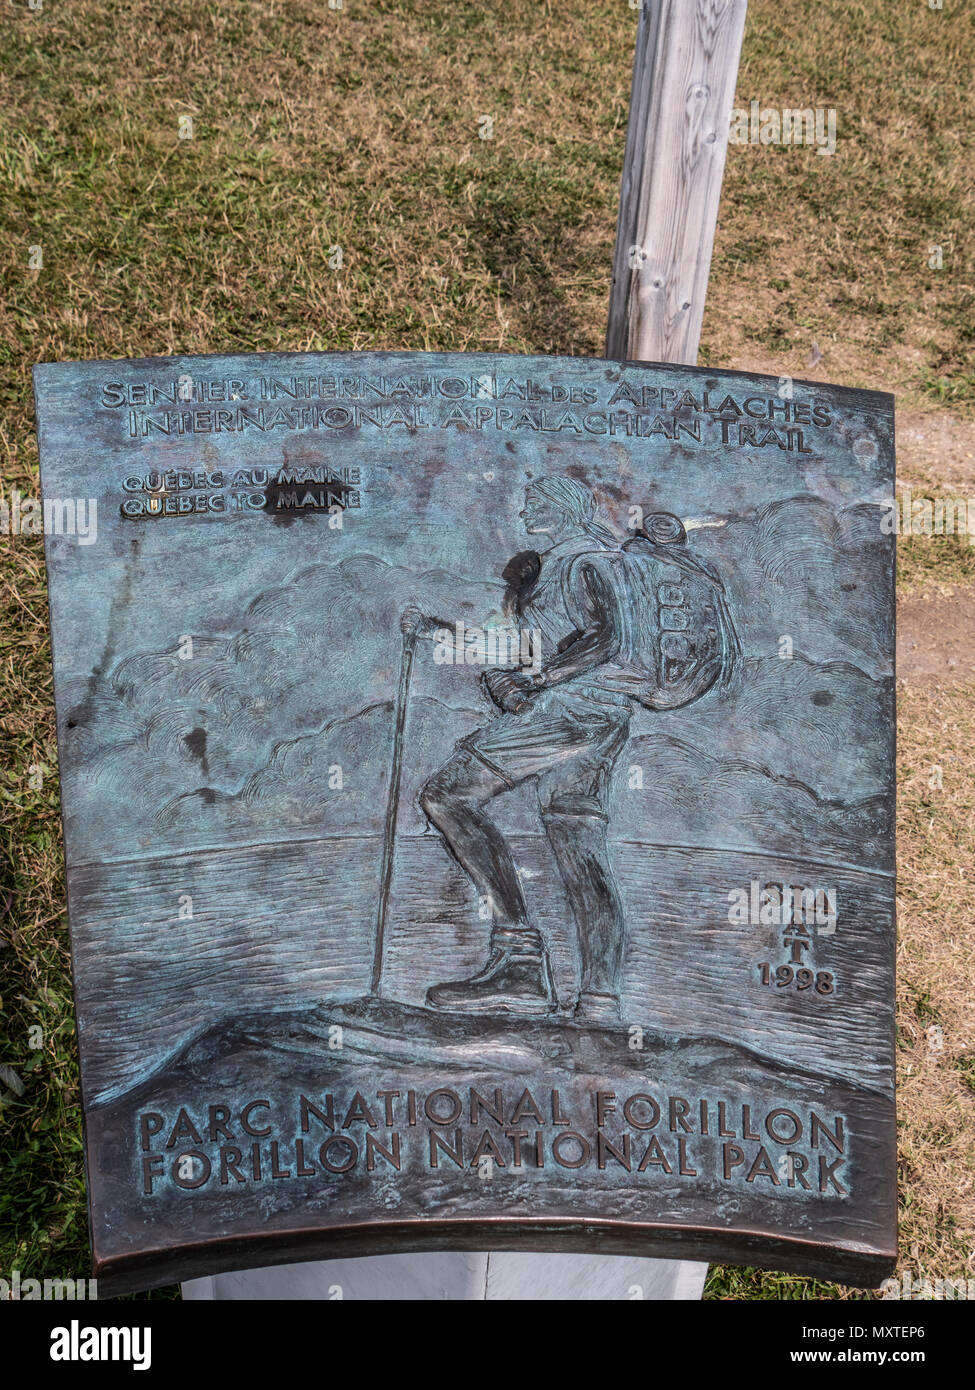 Appalachian Trail plaque at Cap-Gaspe, Le Graves Trail, Forillon National Park, Gaspe Peninsula, Canada. - Stock Image